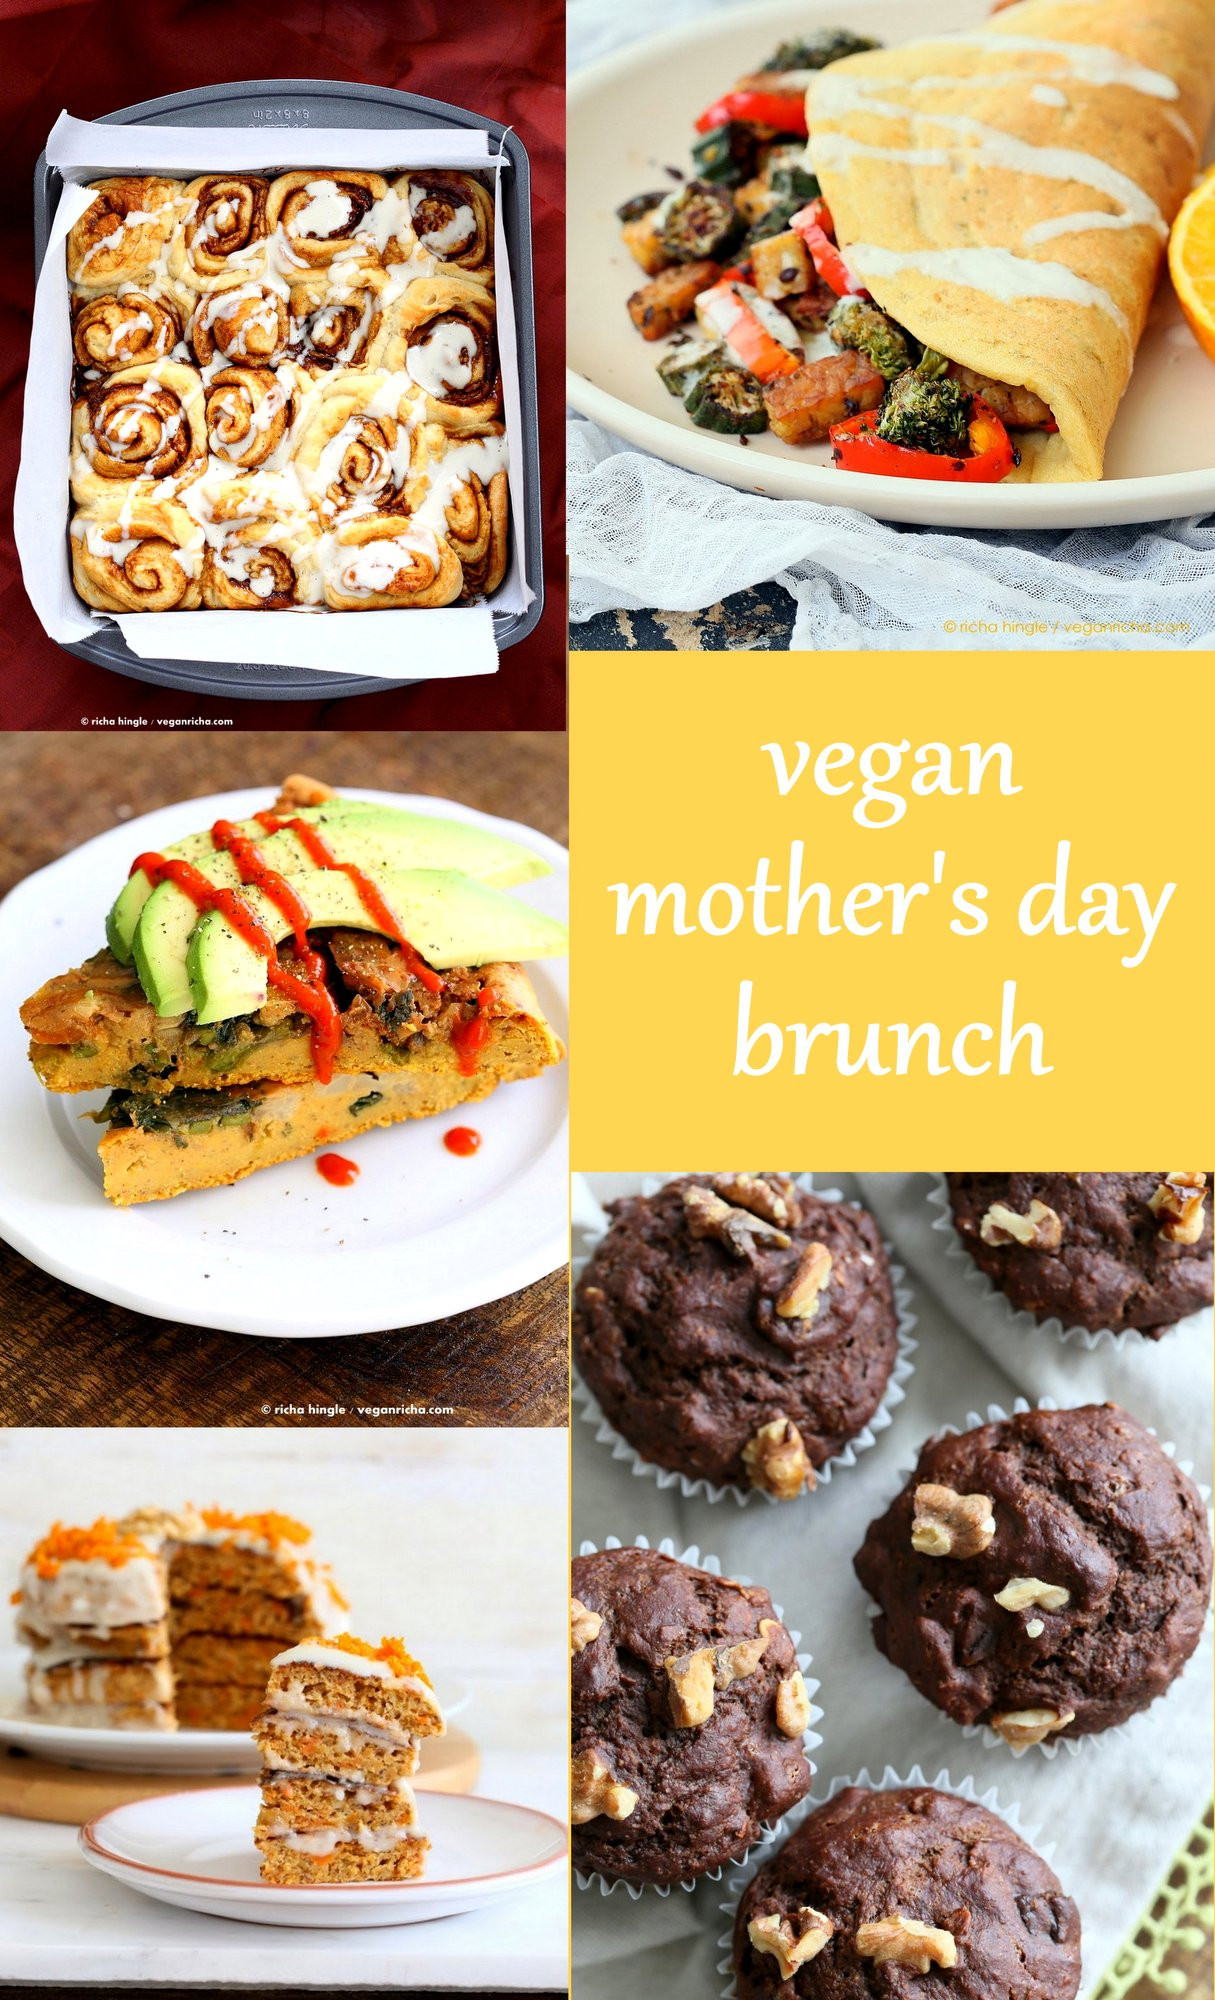 Vegan Gluten Free Brunch Recipes  35 Vegan Mother s Day Brunch Recipes Vegan Richa